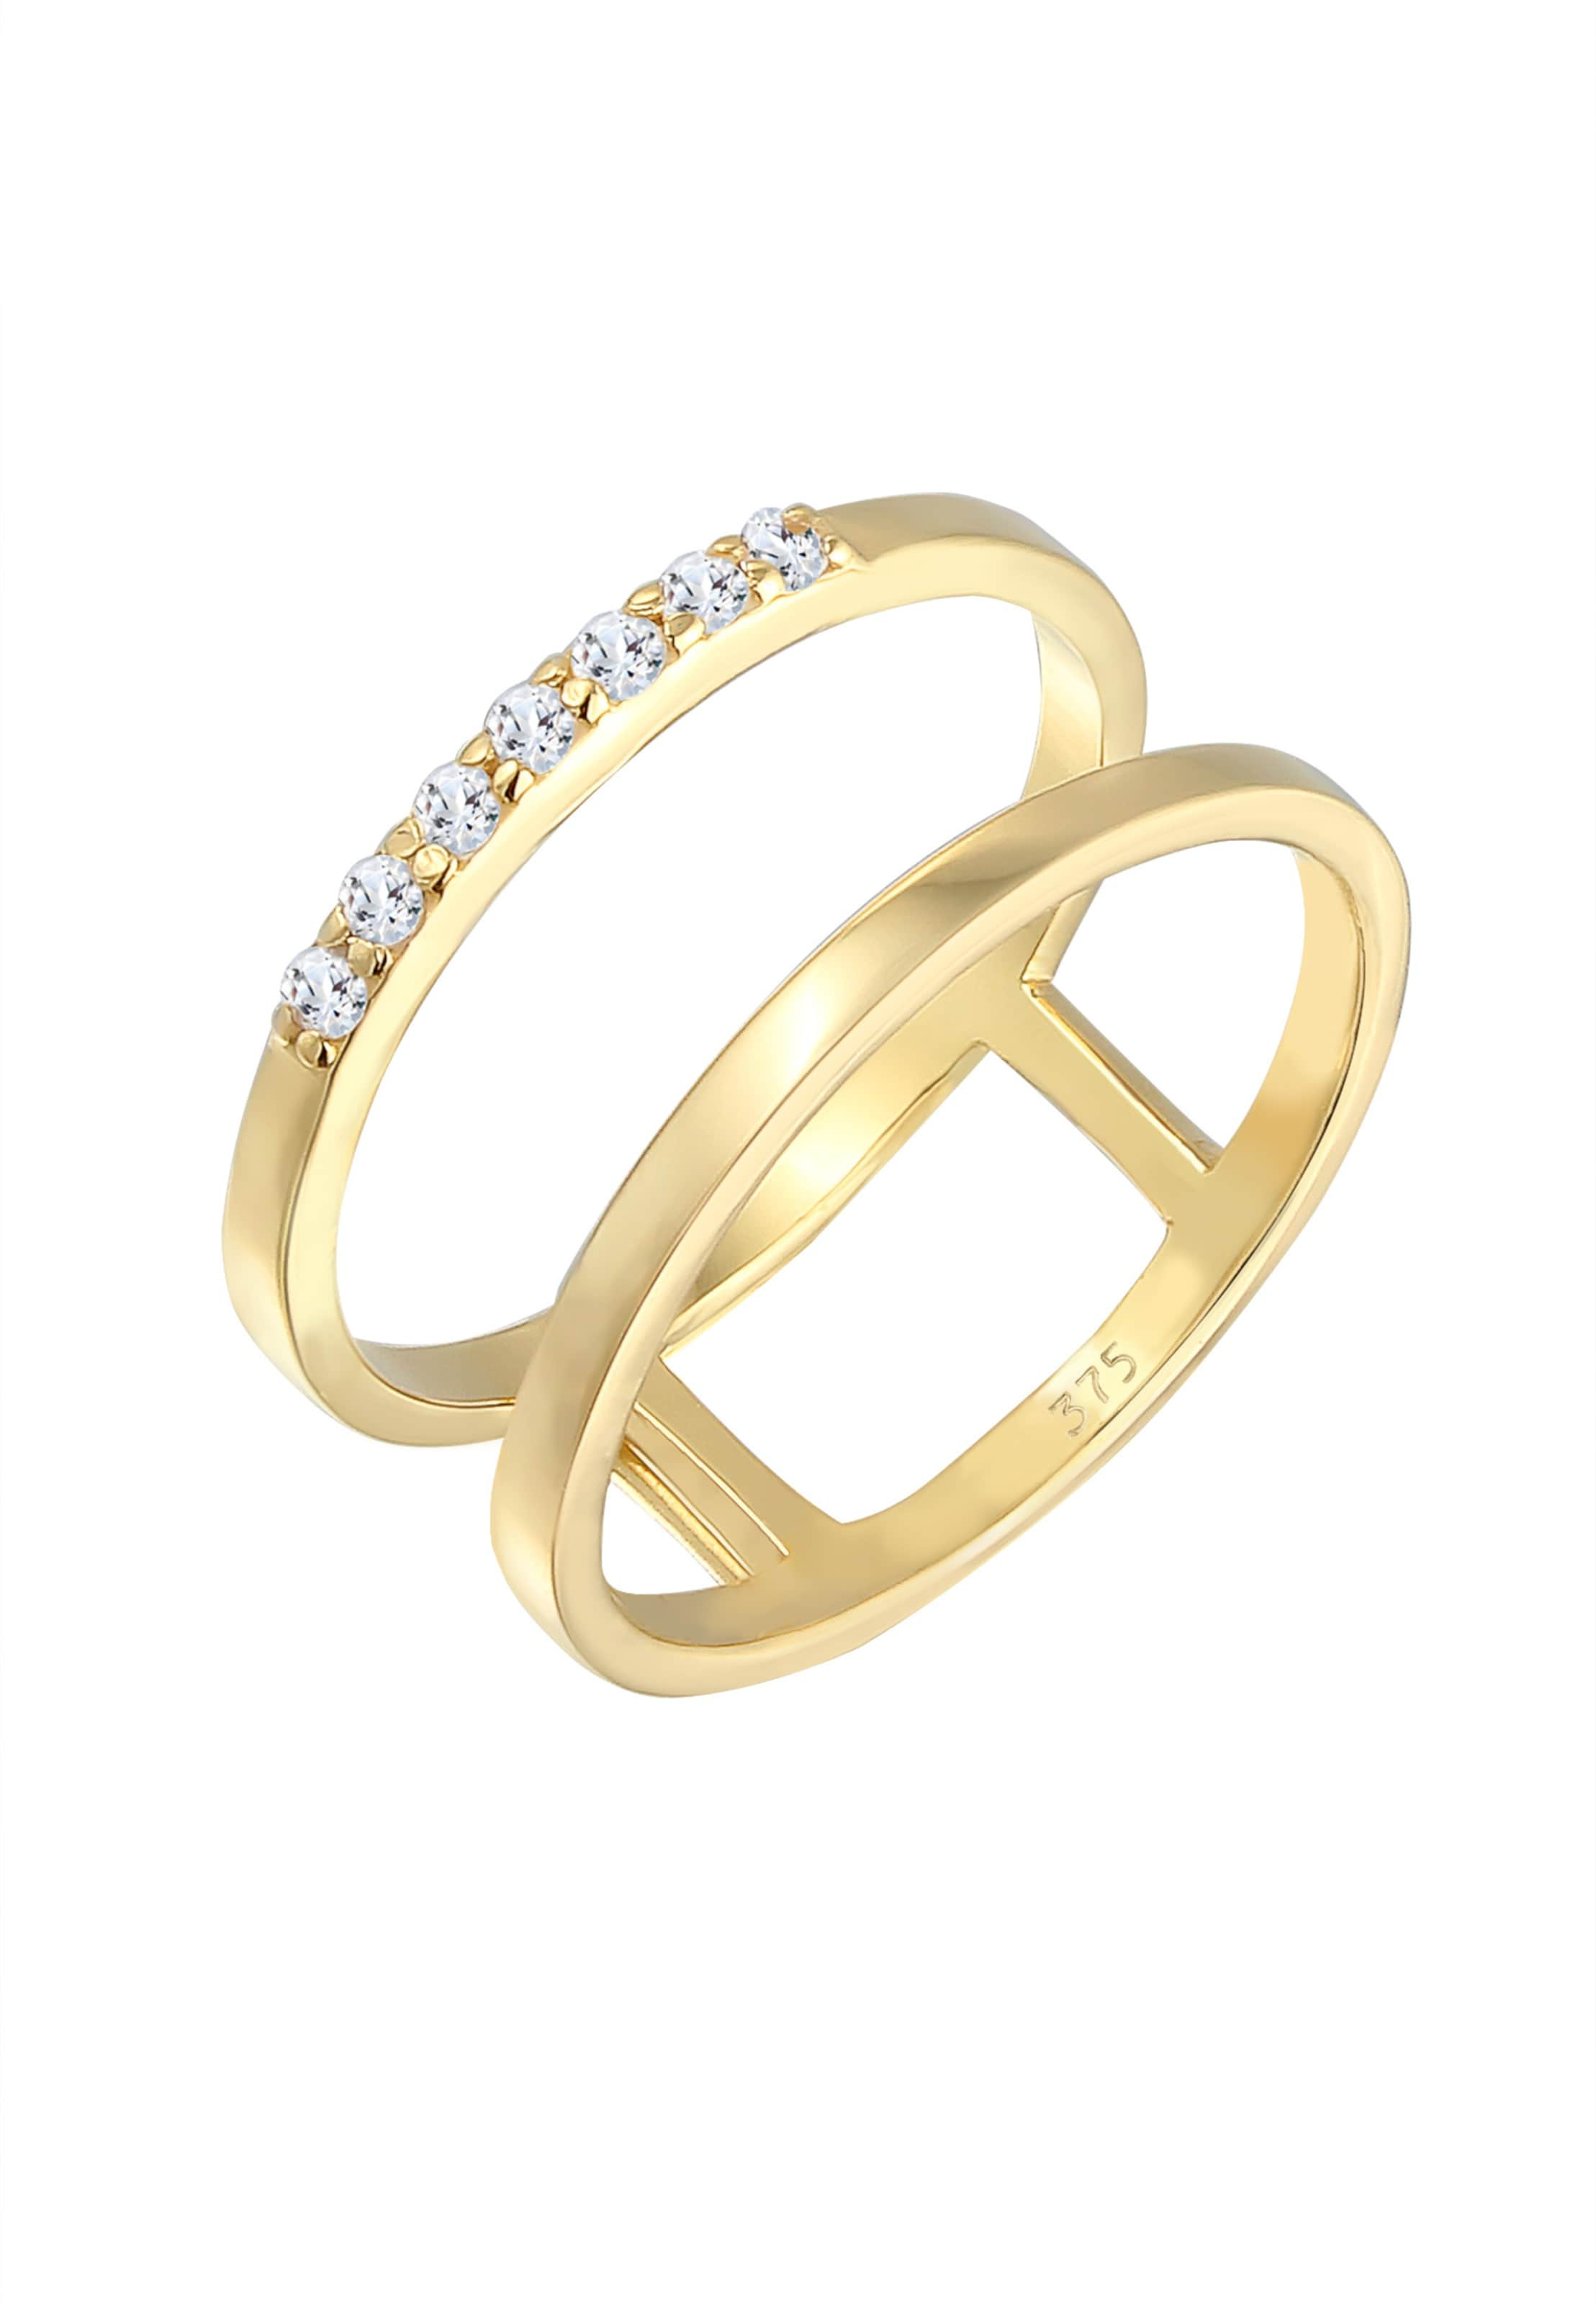 Elli Premium In Gold Elli Premium Verlobungsring In Verlobungsring byI7f6gYv